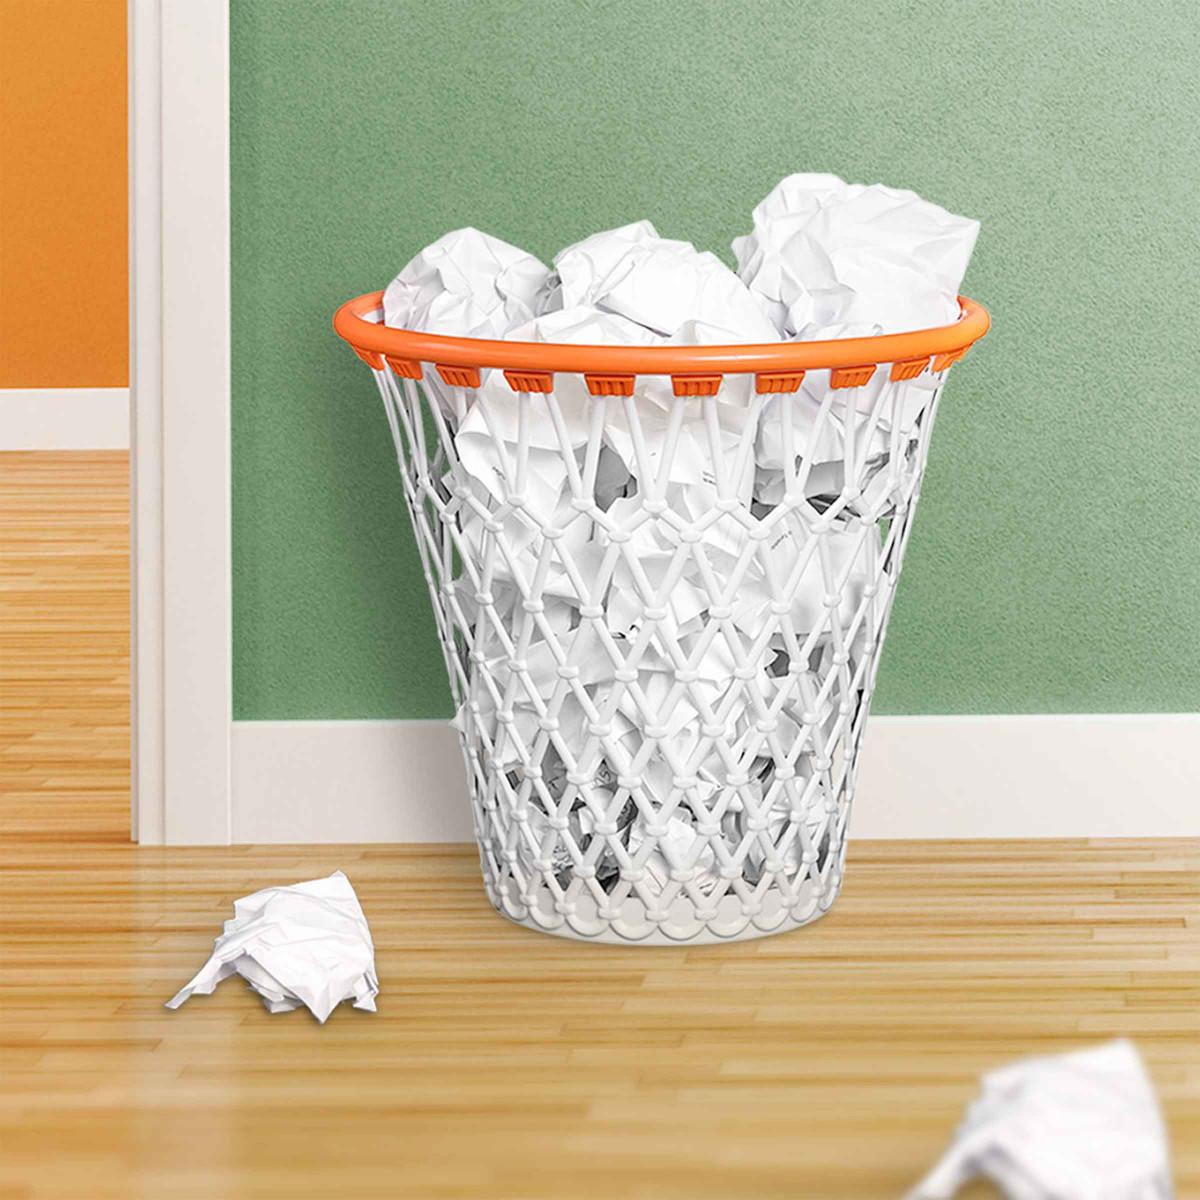 Corbeille papier panier de basket id e cadeau for Panier de basket chambre